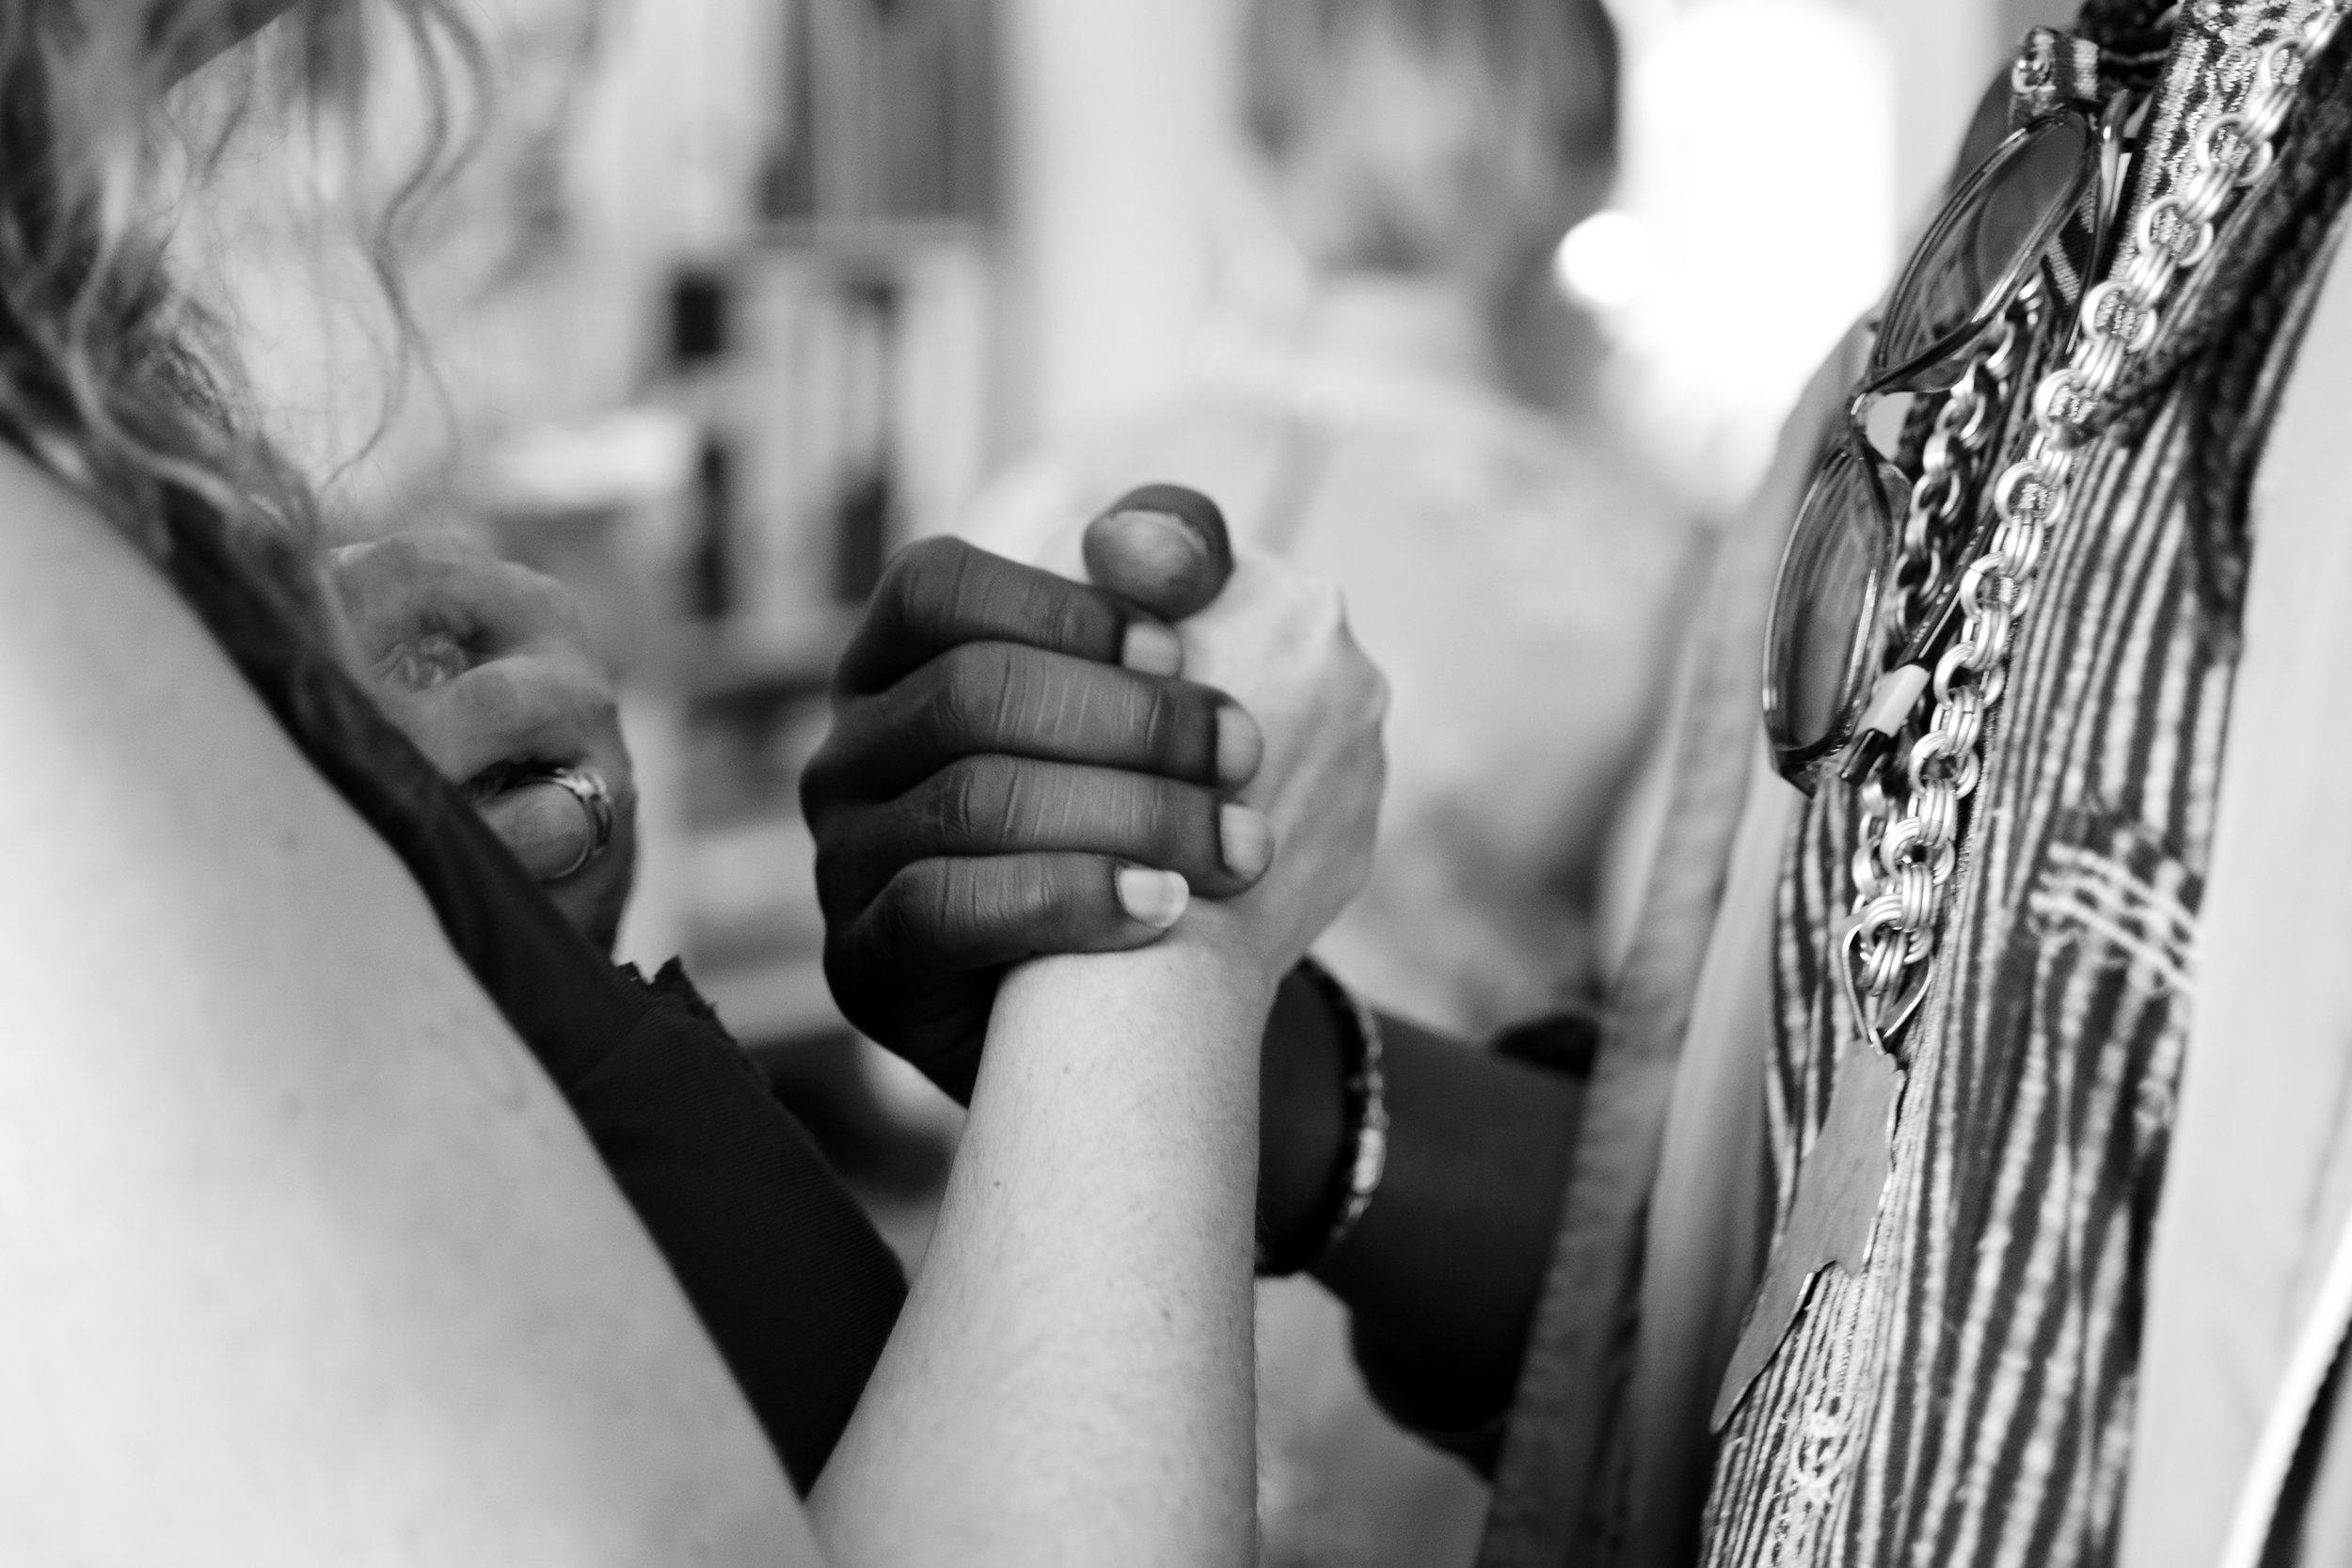 Hand shake between two people.